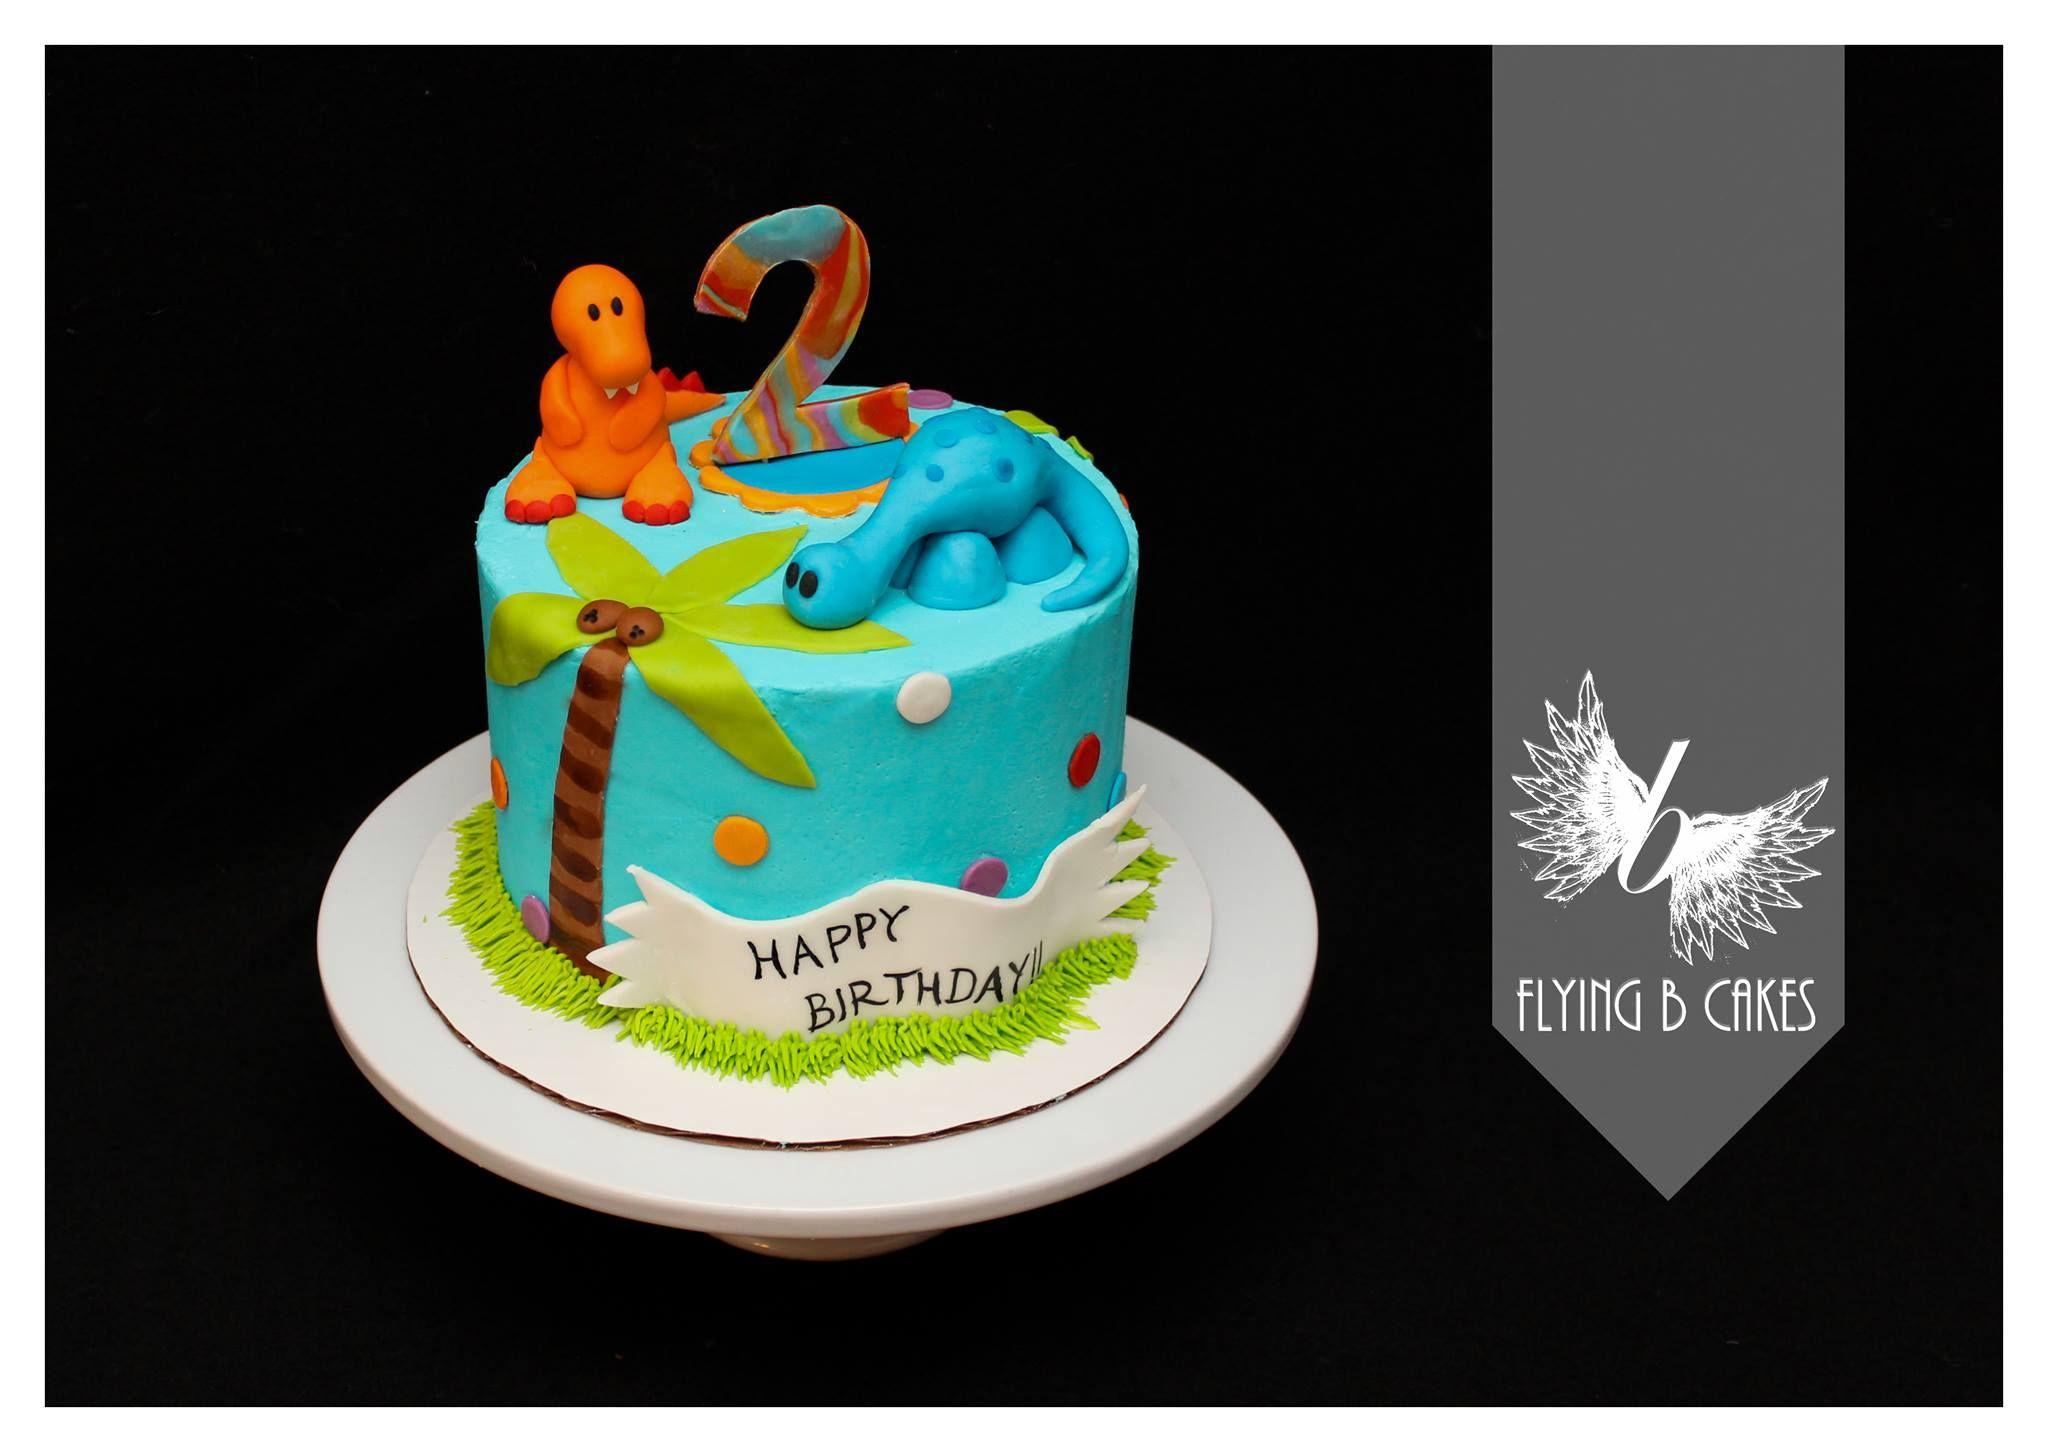 Little boy fondant dinosaur birthday cake wwwflyingbcakescom